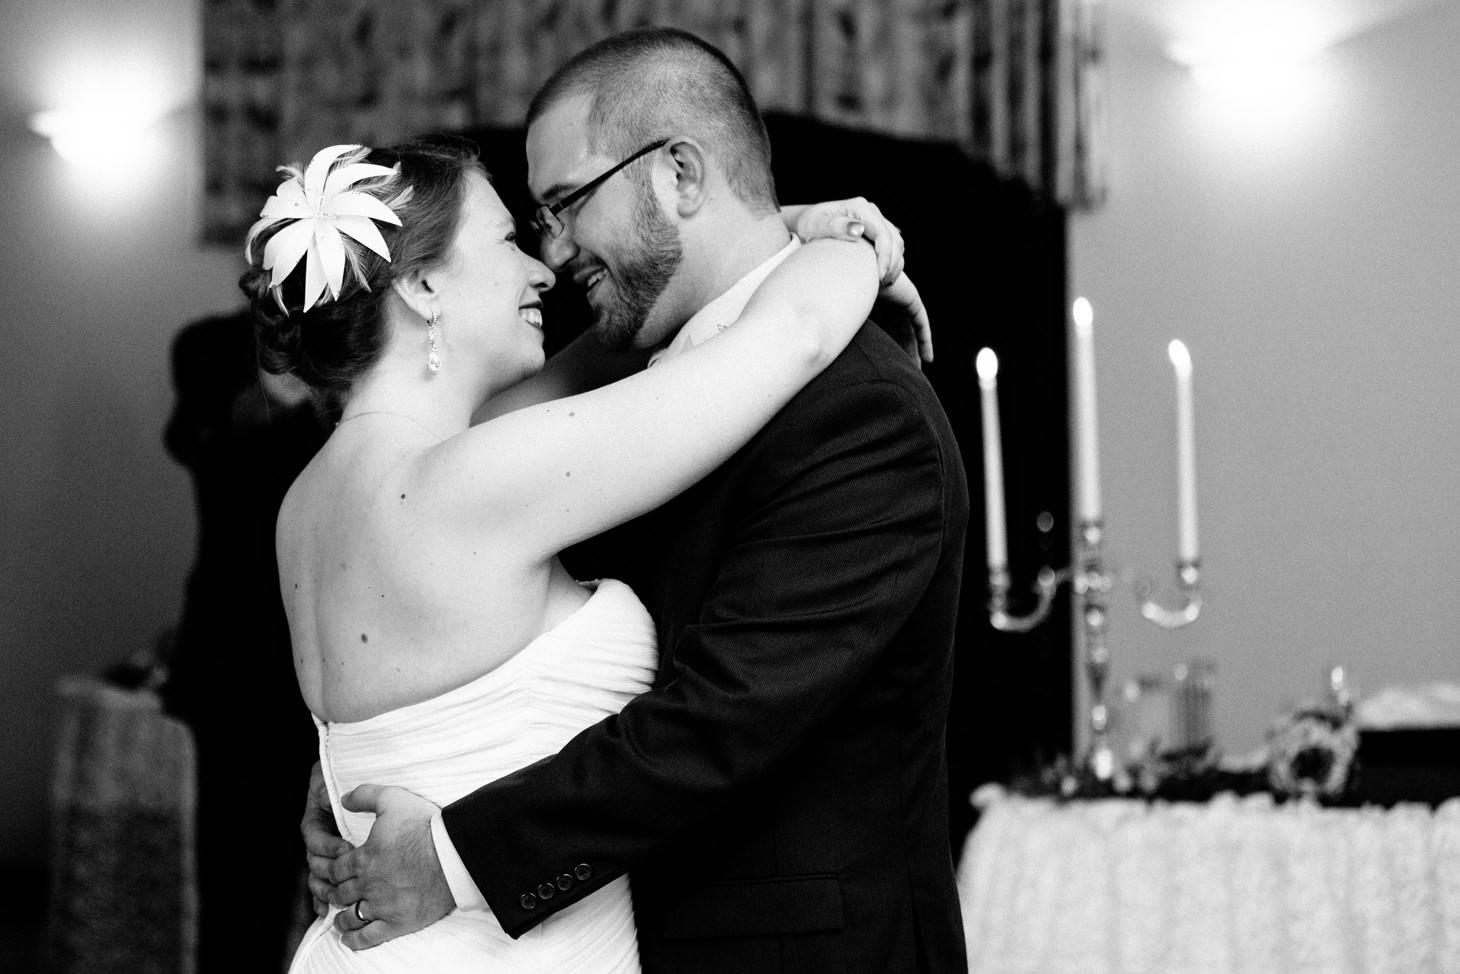 029-nyc-wedding-photographer-nj-nerdy-dr-who-firehouse-wedding-smitten-chickens.jpg